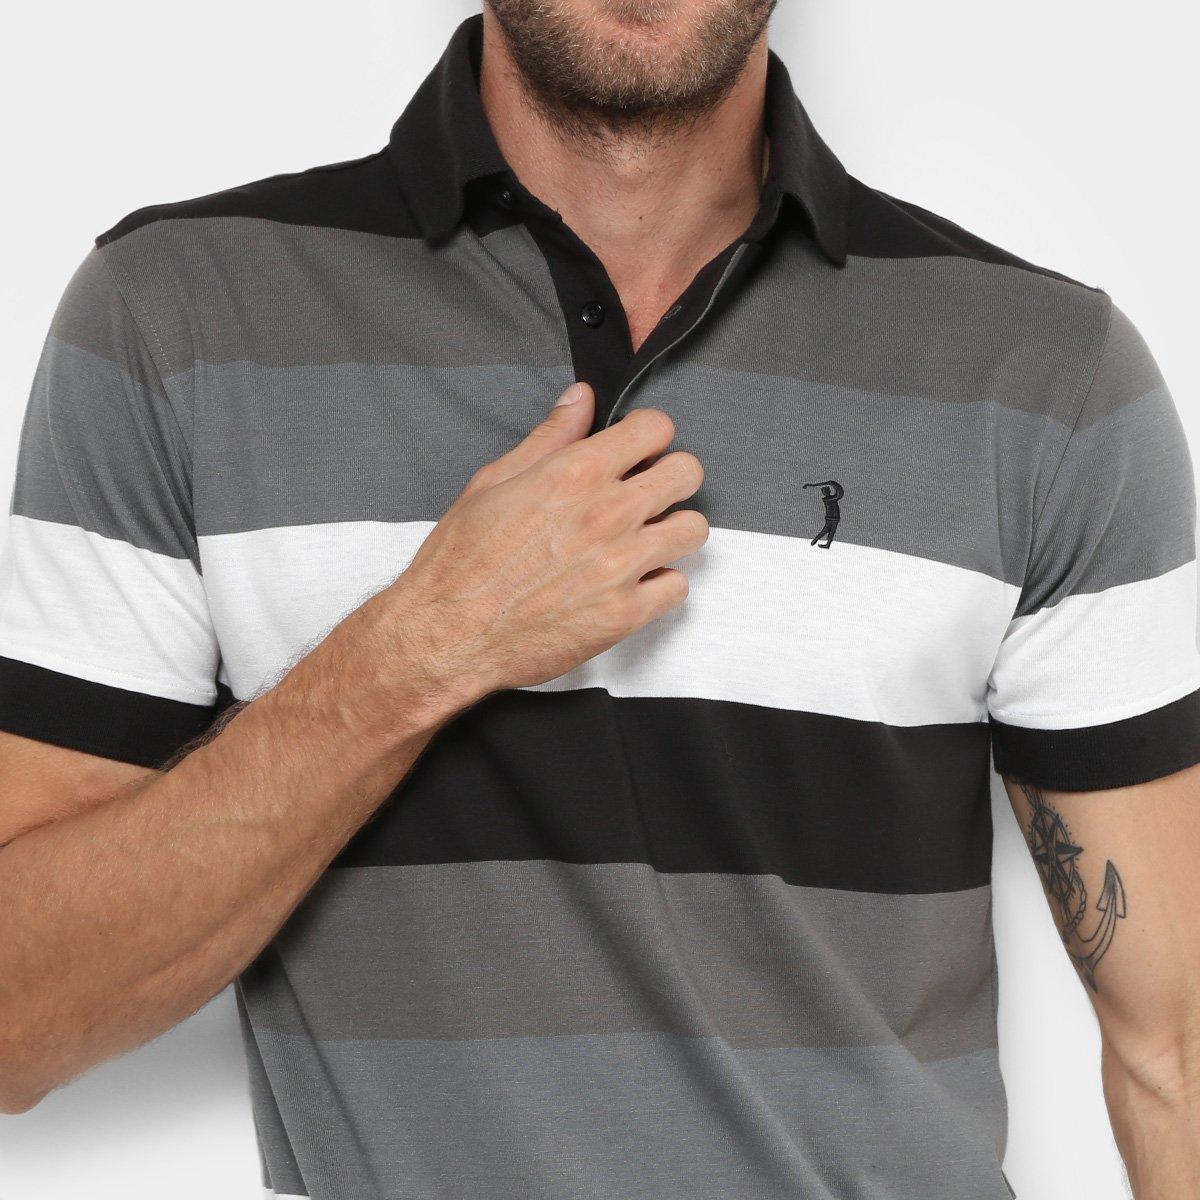 Camisa Polo Aleatory Fio Tinto Listras Masculina - Compre Agora ... dcc0706065c7d